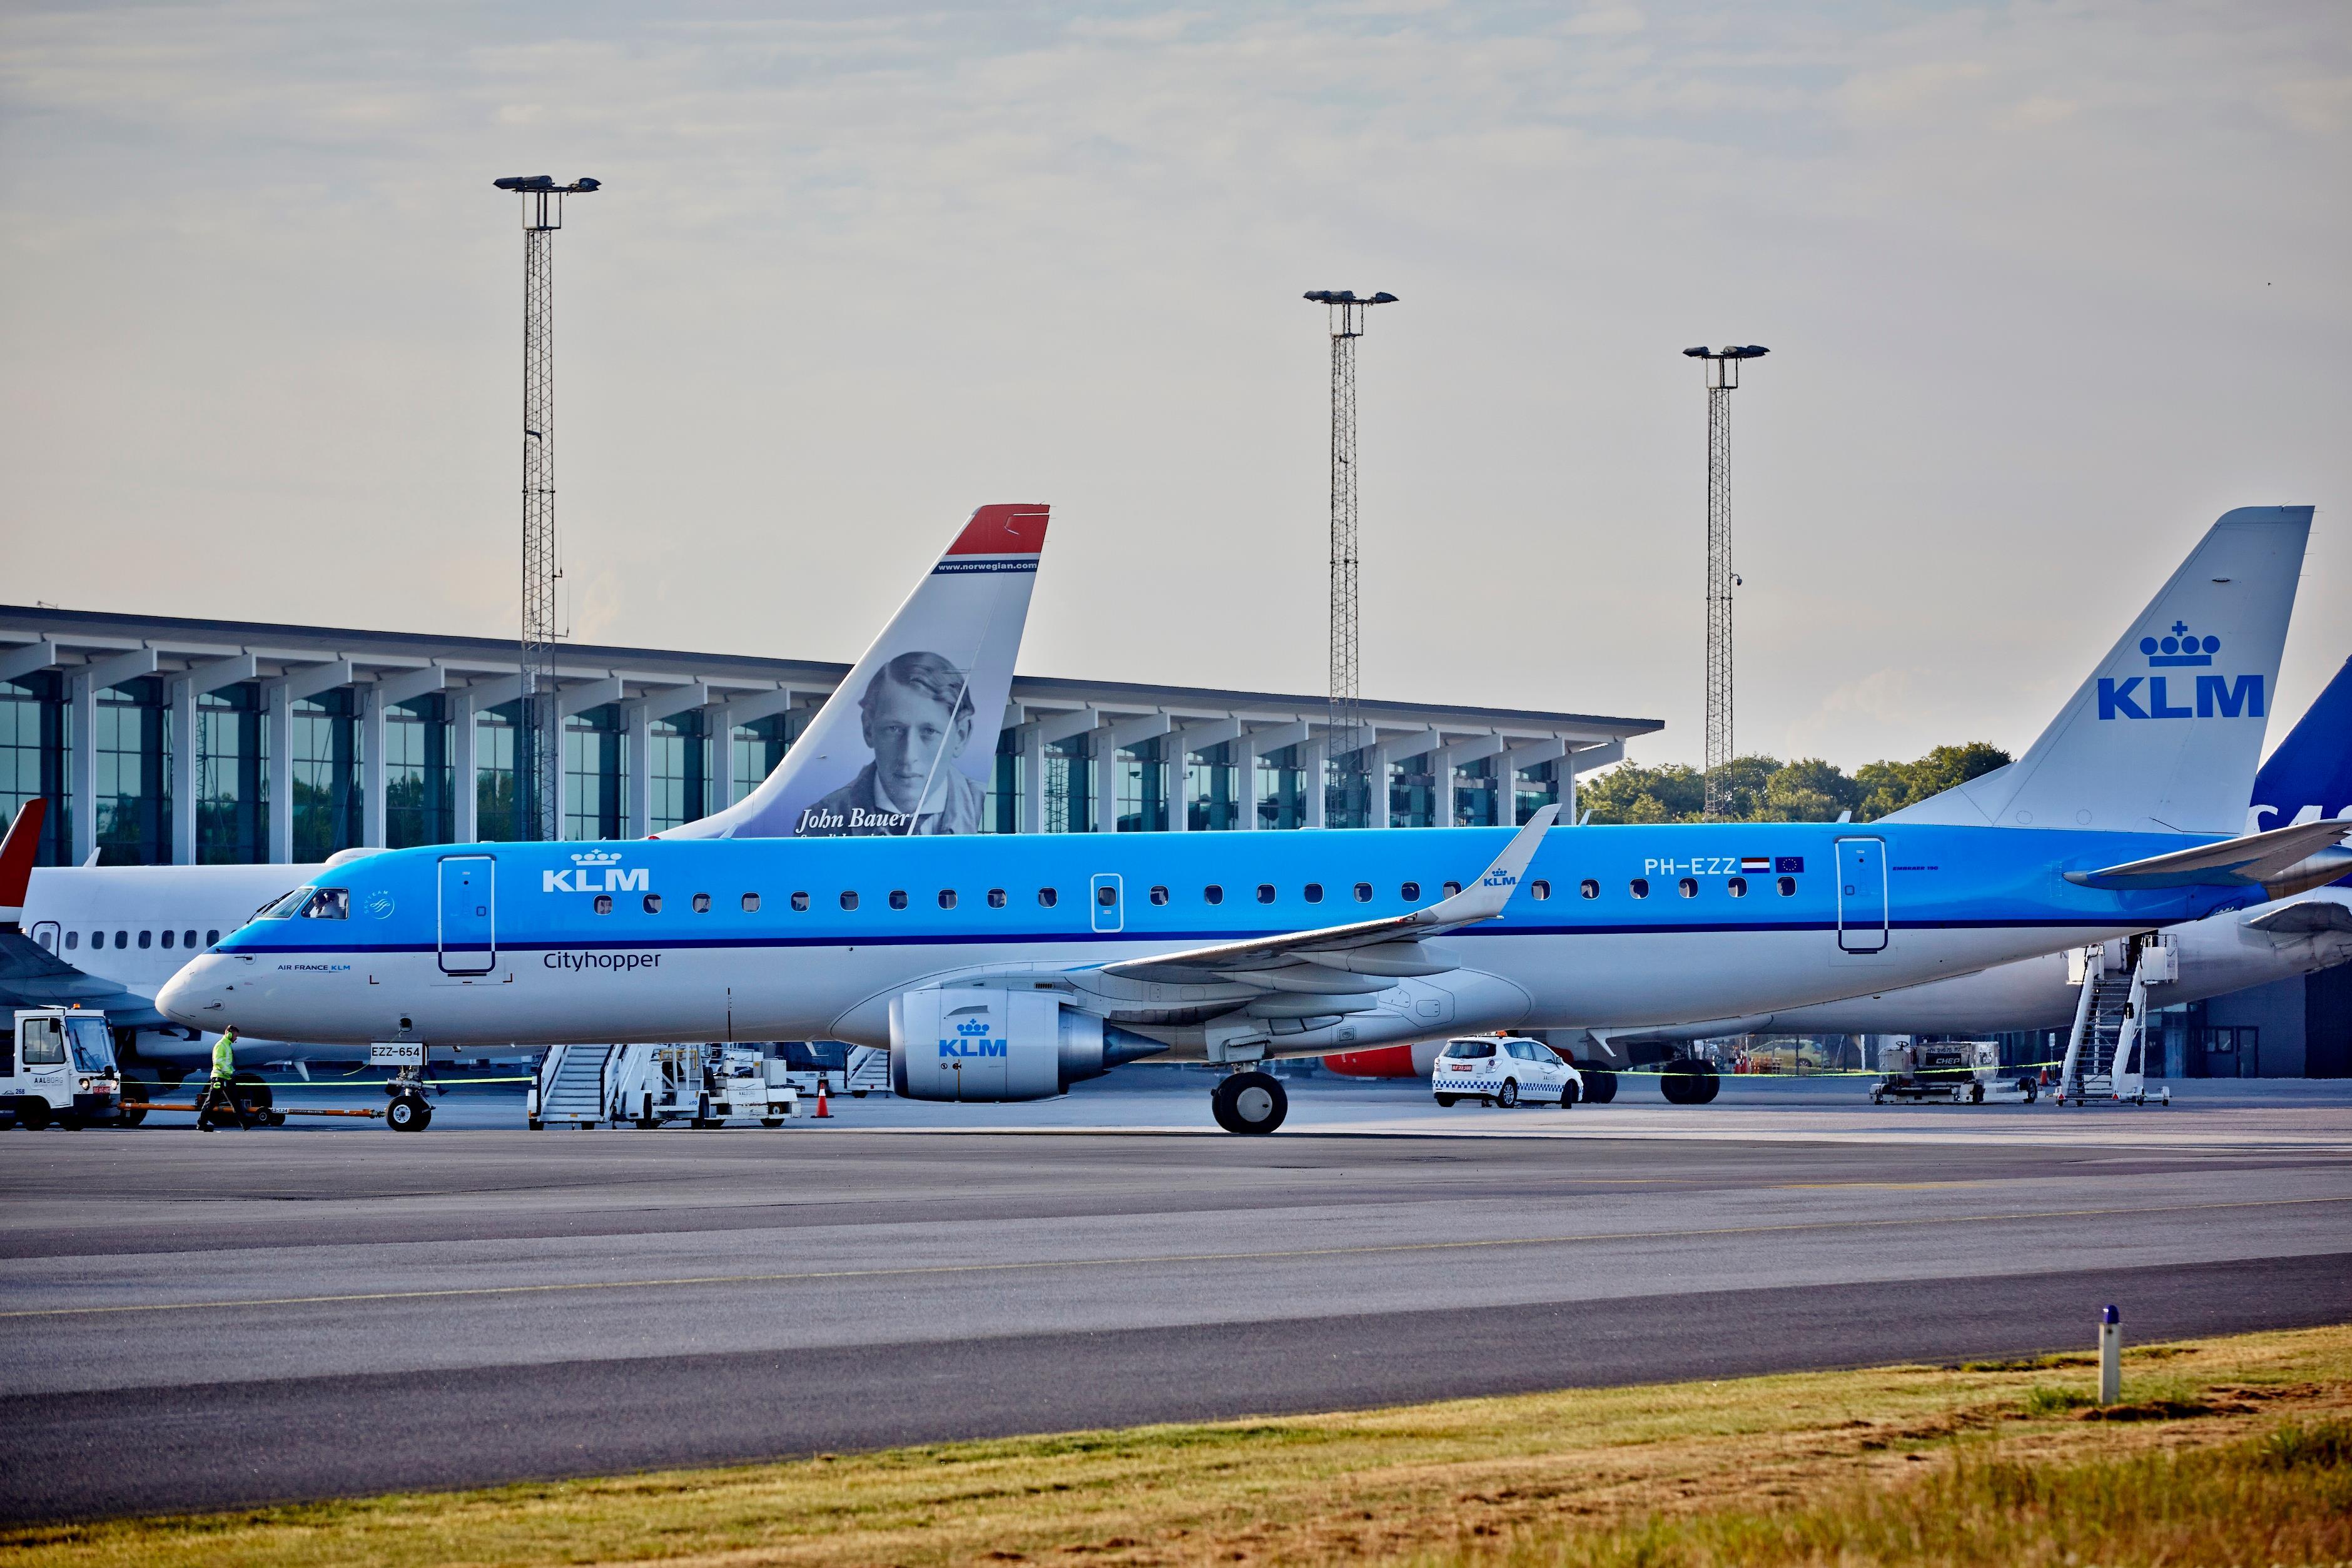 Foto fra Aalborg Lufthavn, hvor Norwegian samlet er største kunde, mens KLM har den største udenrigsrute – fra Amsterdam til Aalborg med fire flyvninger på hverdage. Pressefoto fra Aalborg Lufthavn.